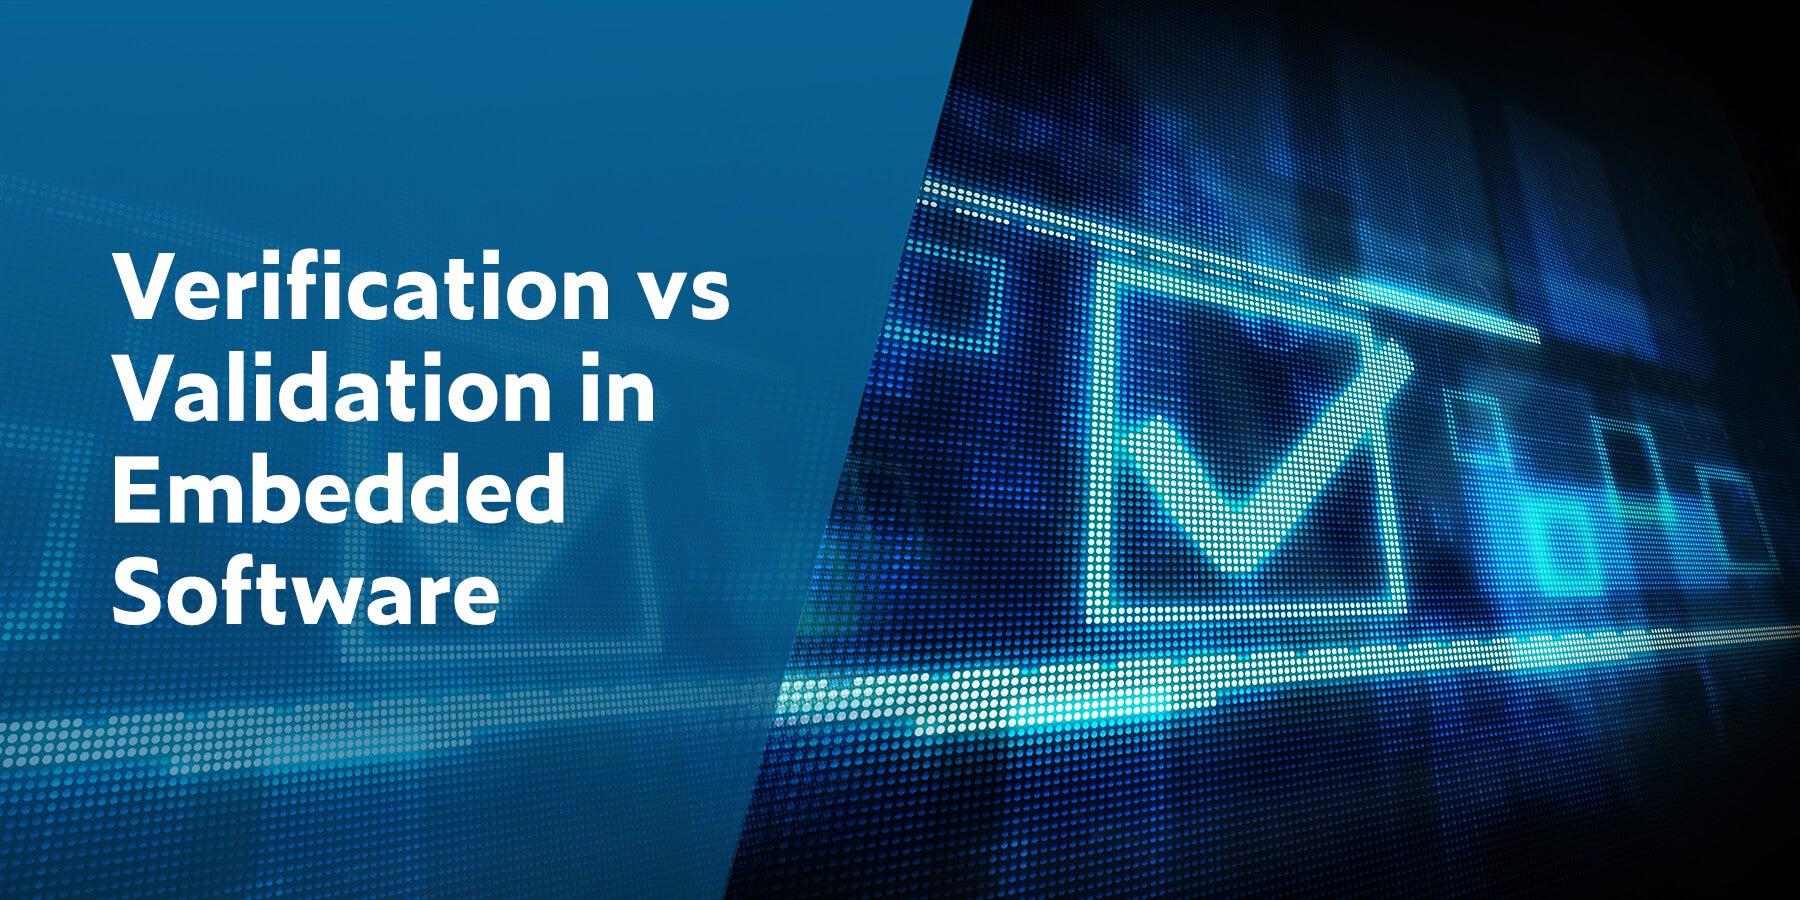 Verification vs Validation in Embedded Software